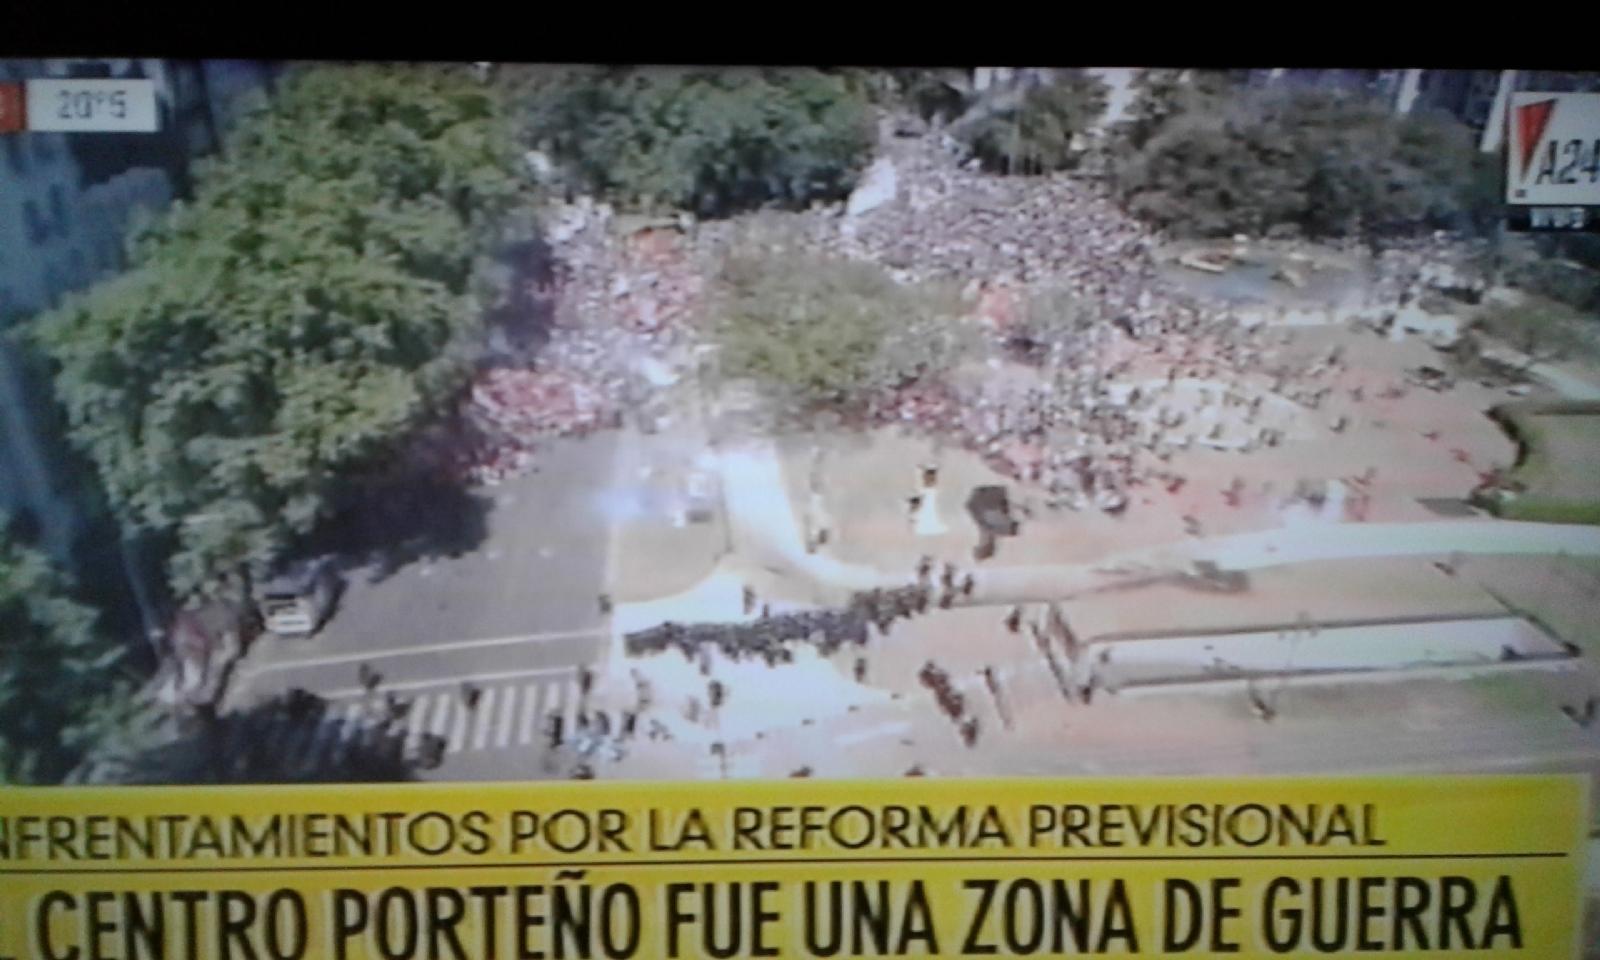 Policía argentina reprime severamente a manifestantes frente al Congreso (+ Fotos)